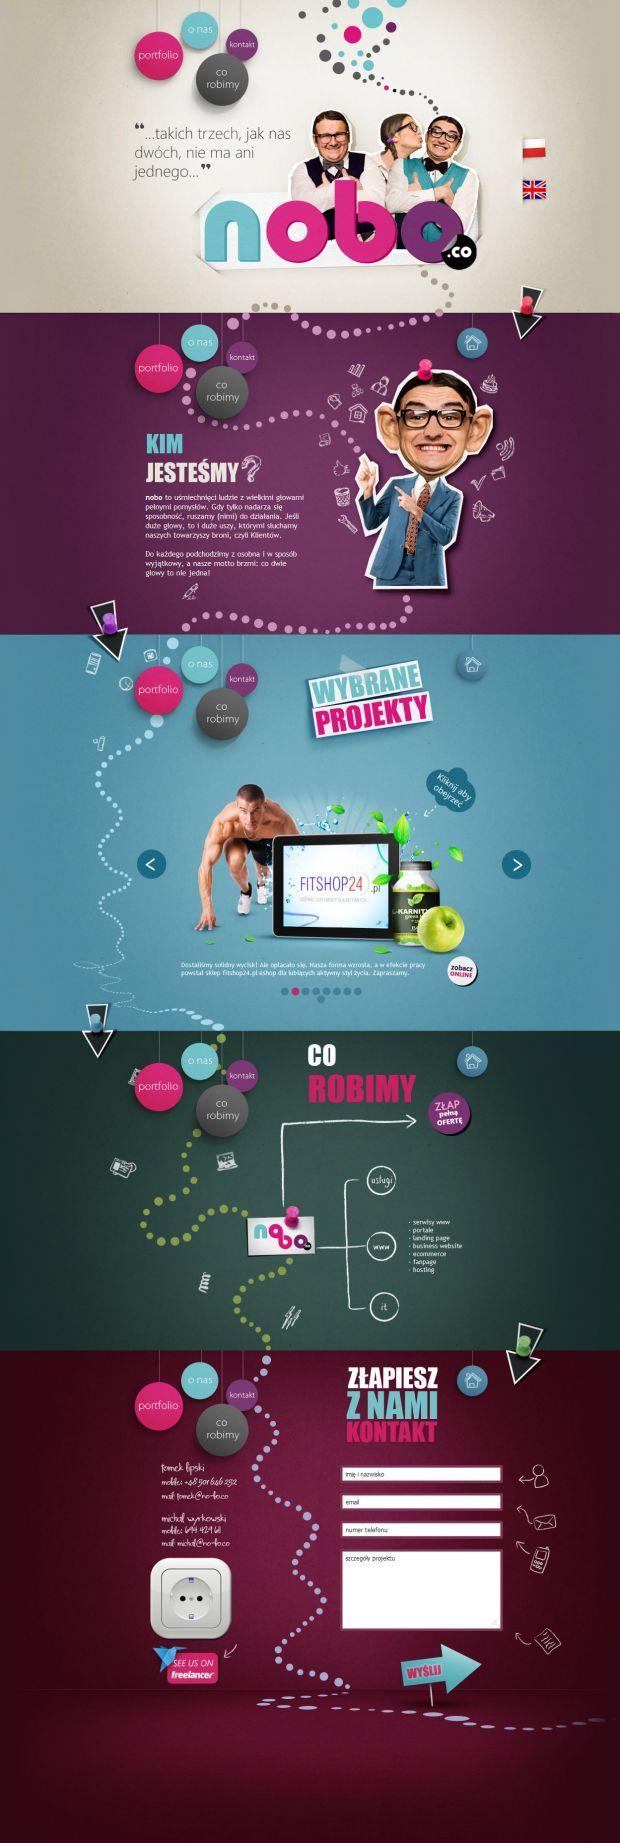 nobo agency - Best website, web design inspiration showcase